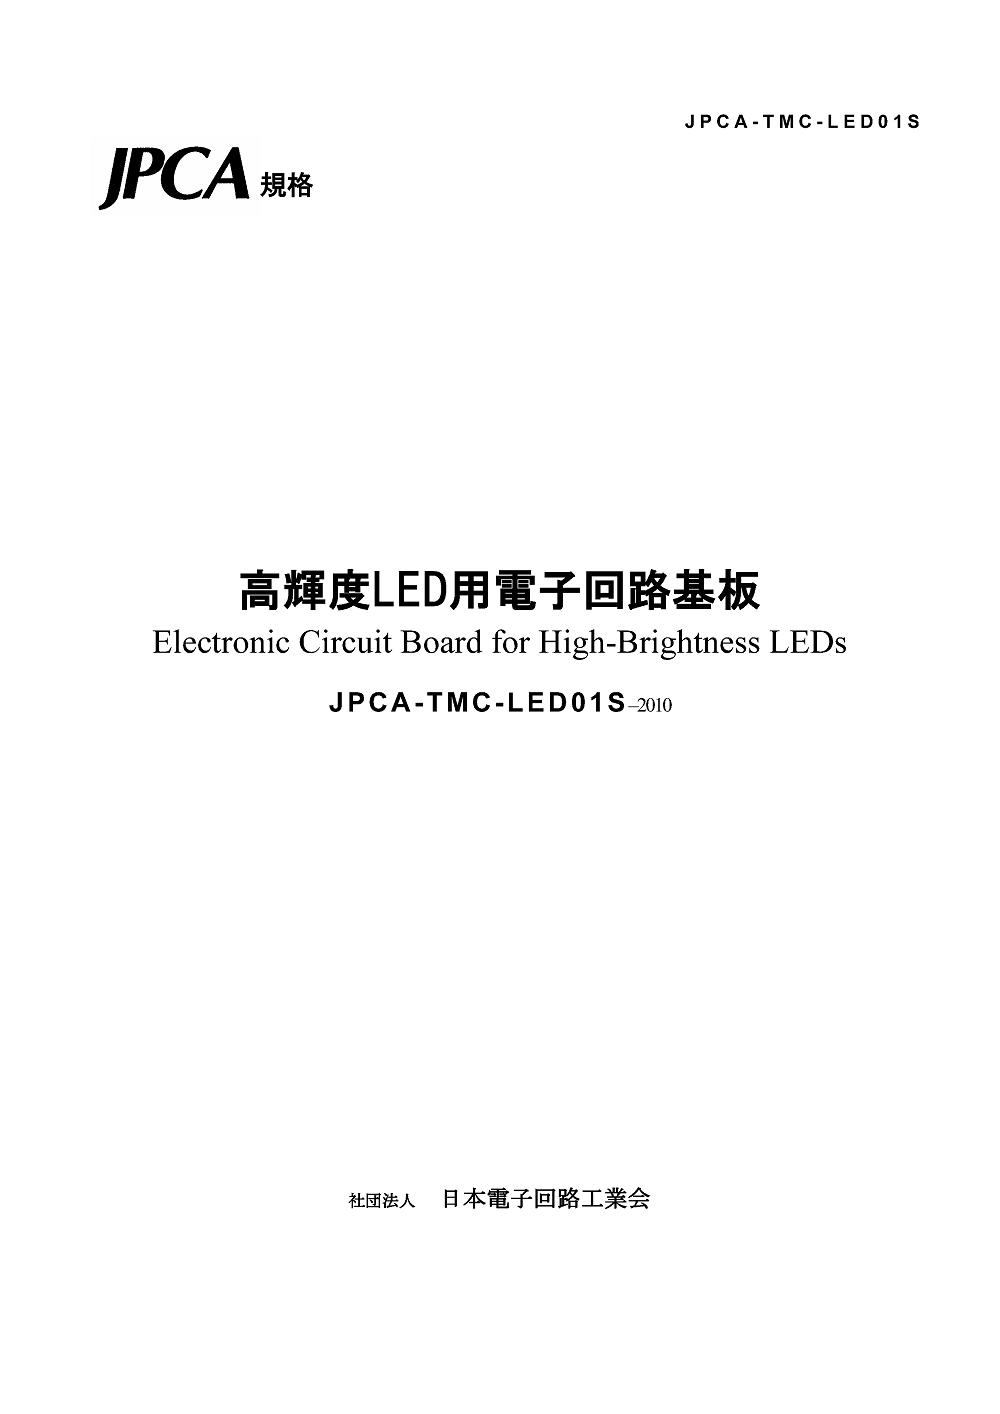 JPCA-TMC-LED01S-2010